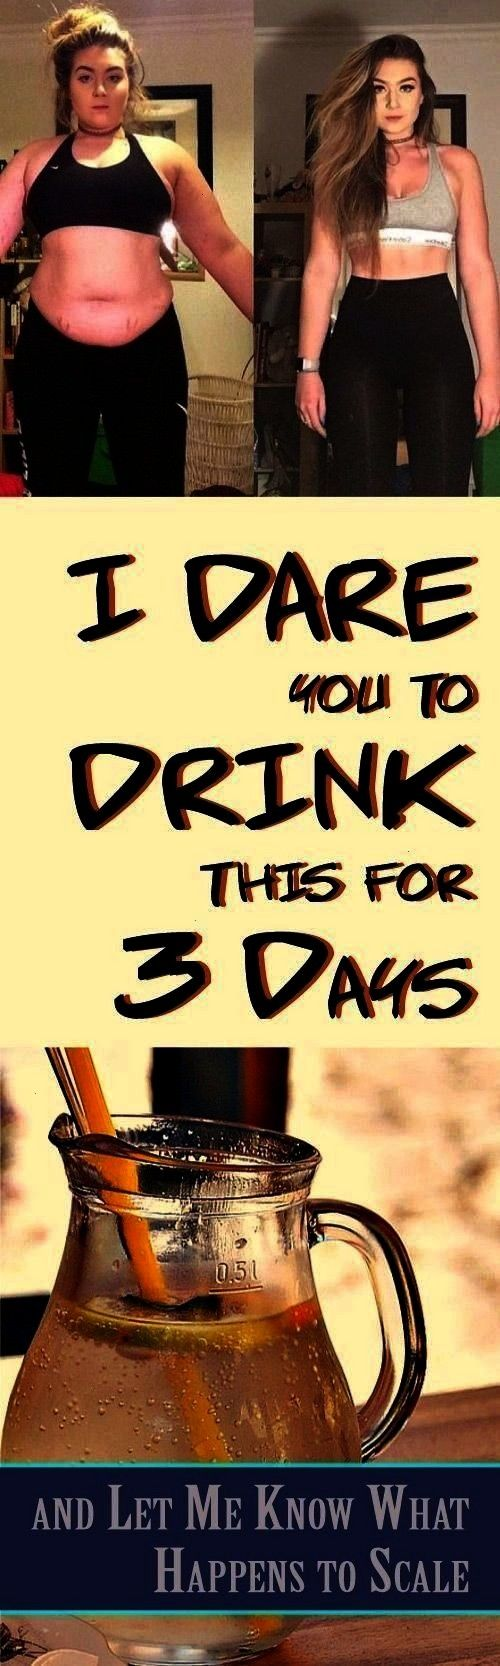 #acupressure #skalieren #lifehacks #passiert #diesdare #happens #fitness #trinken #wissen #drink #th...